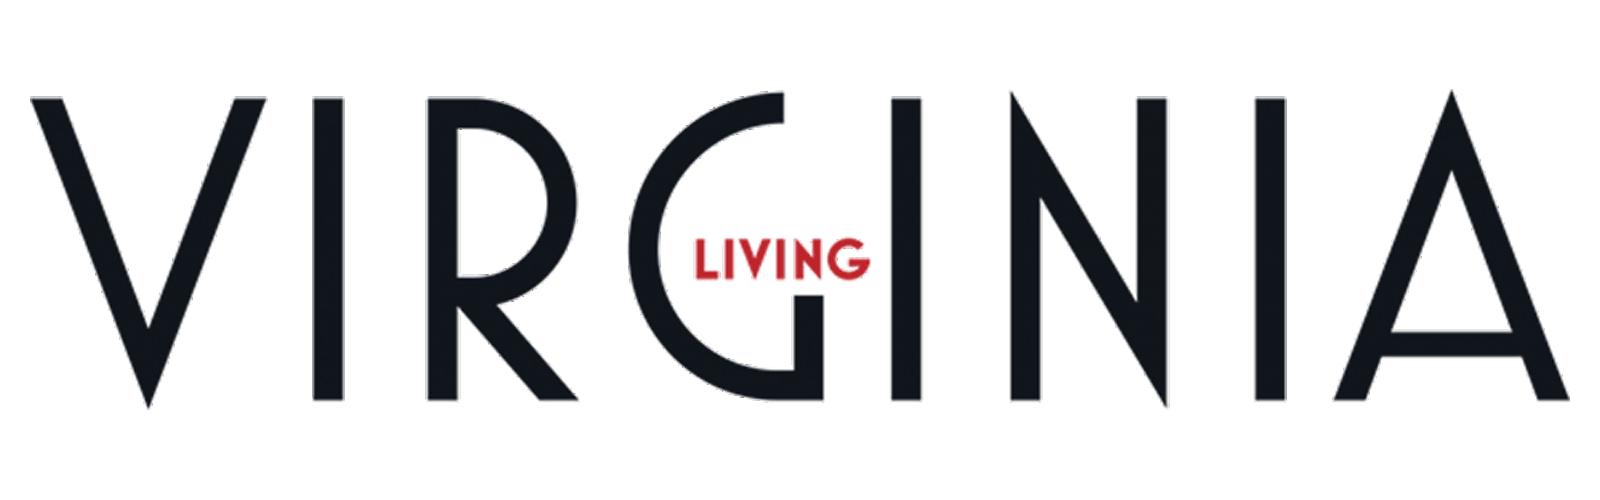 Virginia Living